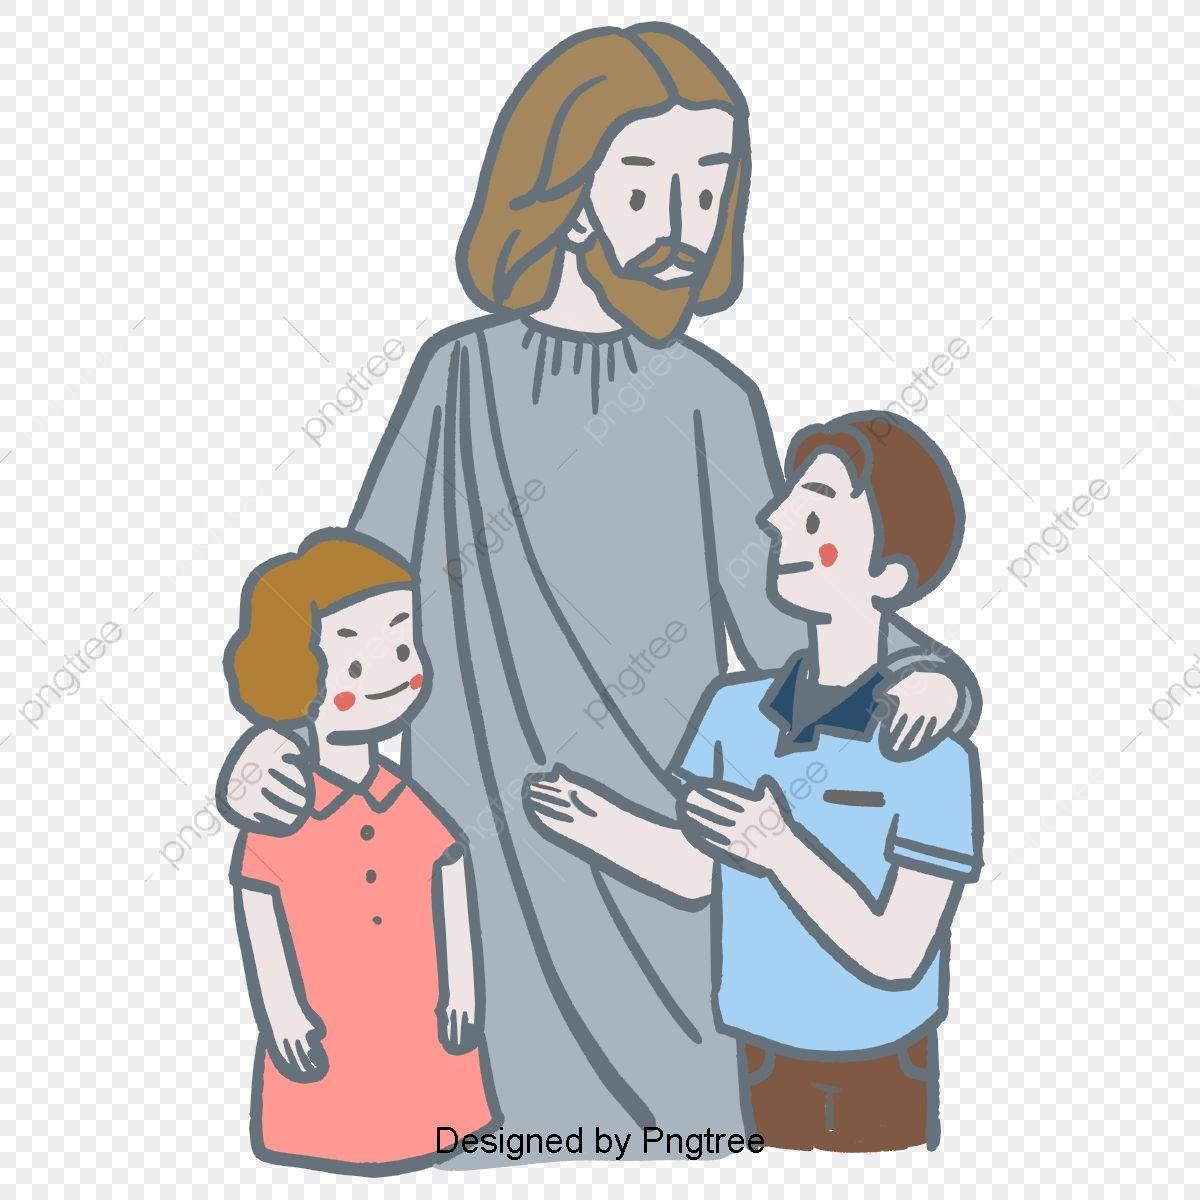 gambar cerita alkitab tuhan yesus kristus menjaga anak anak tangan ditarik ilustrasi alkitab tuhan yesus png dan psd untuk muat turun percuma di 2020 alkitab kristus ilustrasi gambar cerita alkitab tuhan yesus